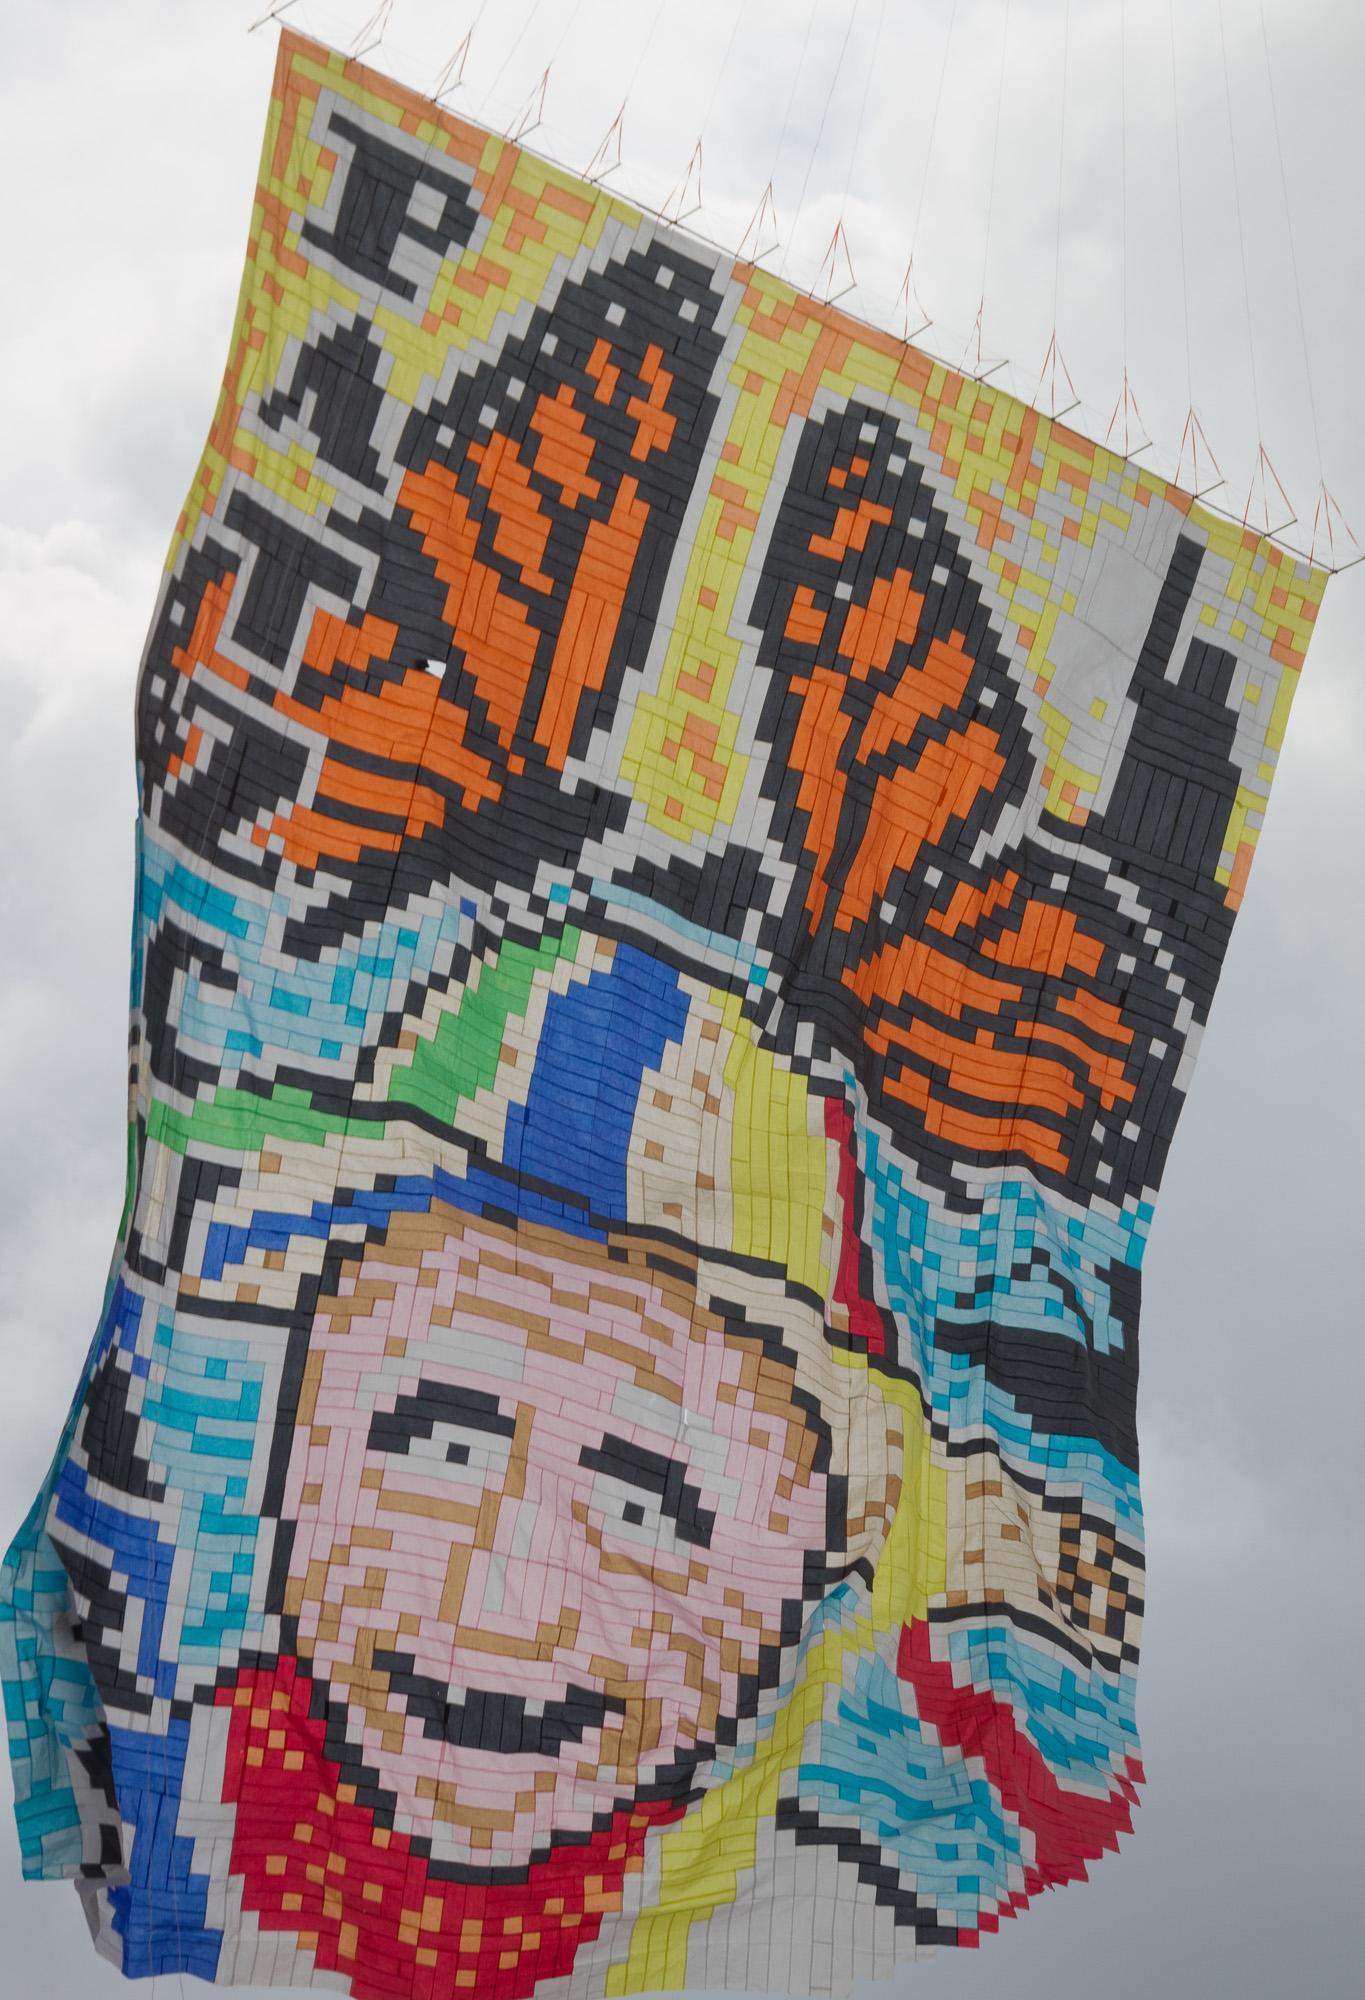 Tail Winds   CantoyaFest: Pátzcuaro, Michoacán, Mexico — Saturday, July 22, 2017